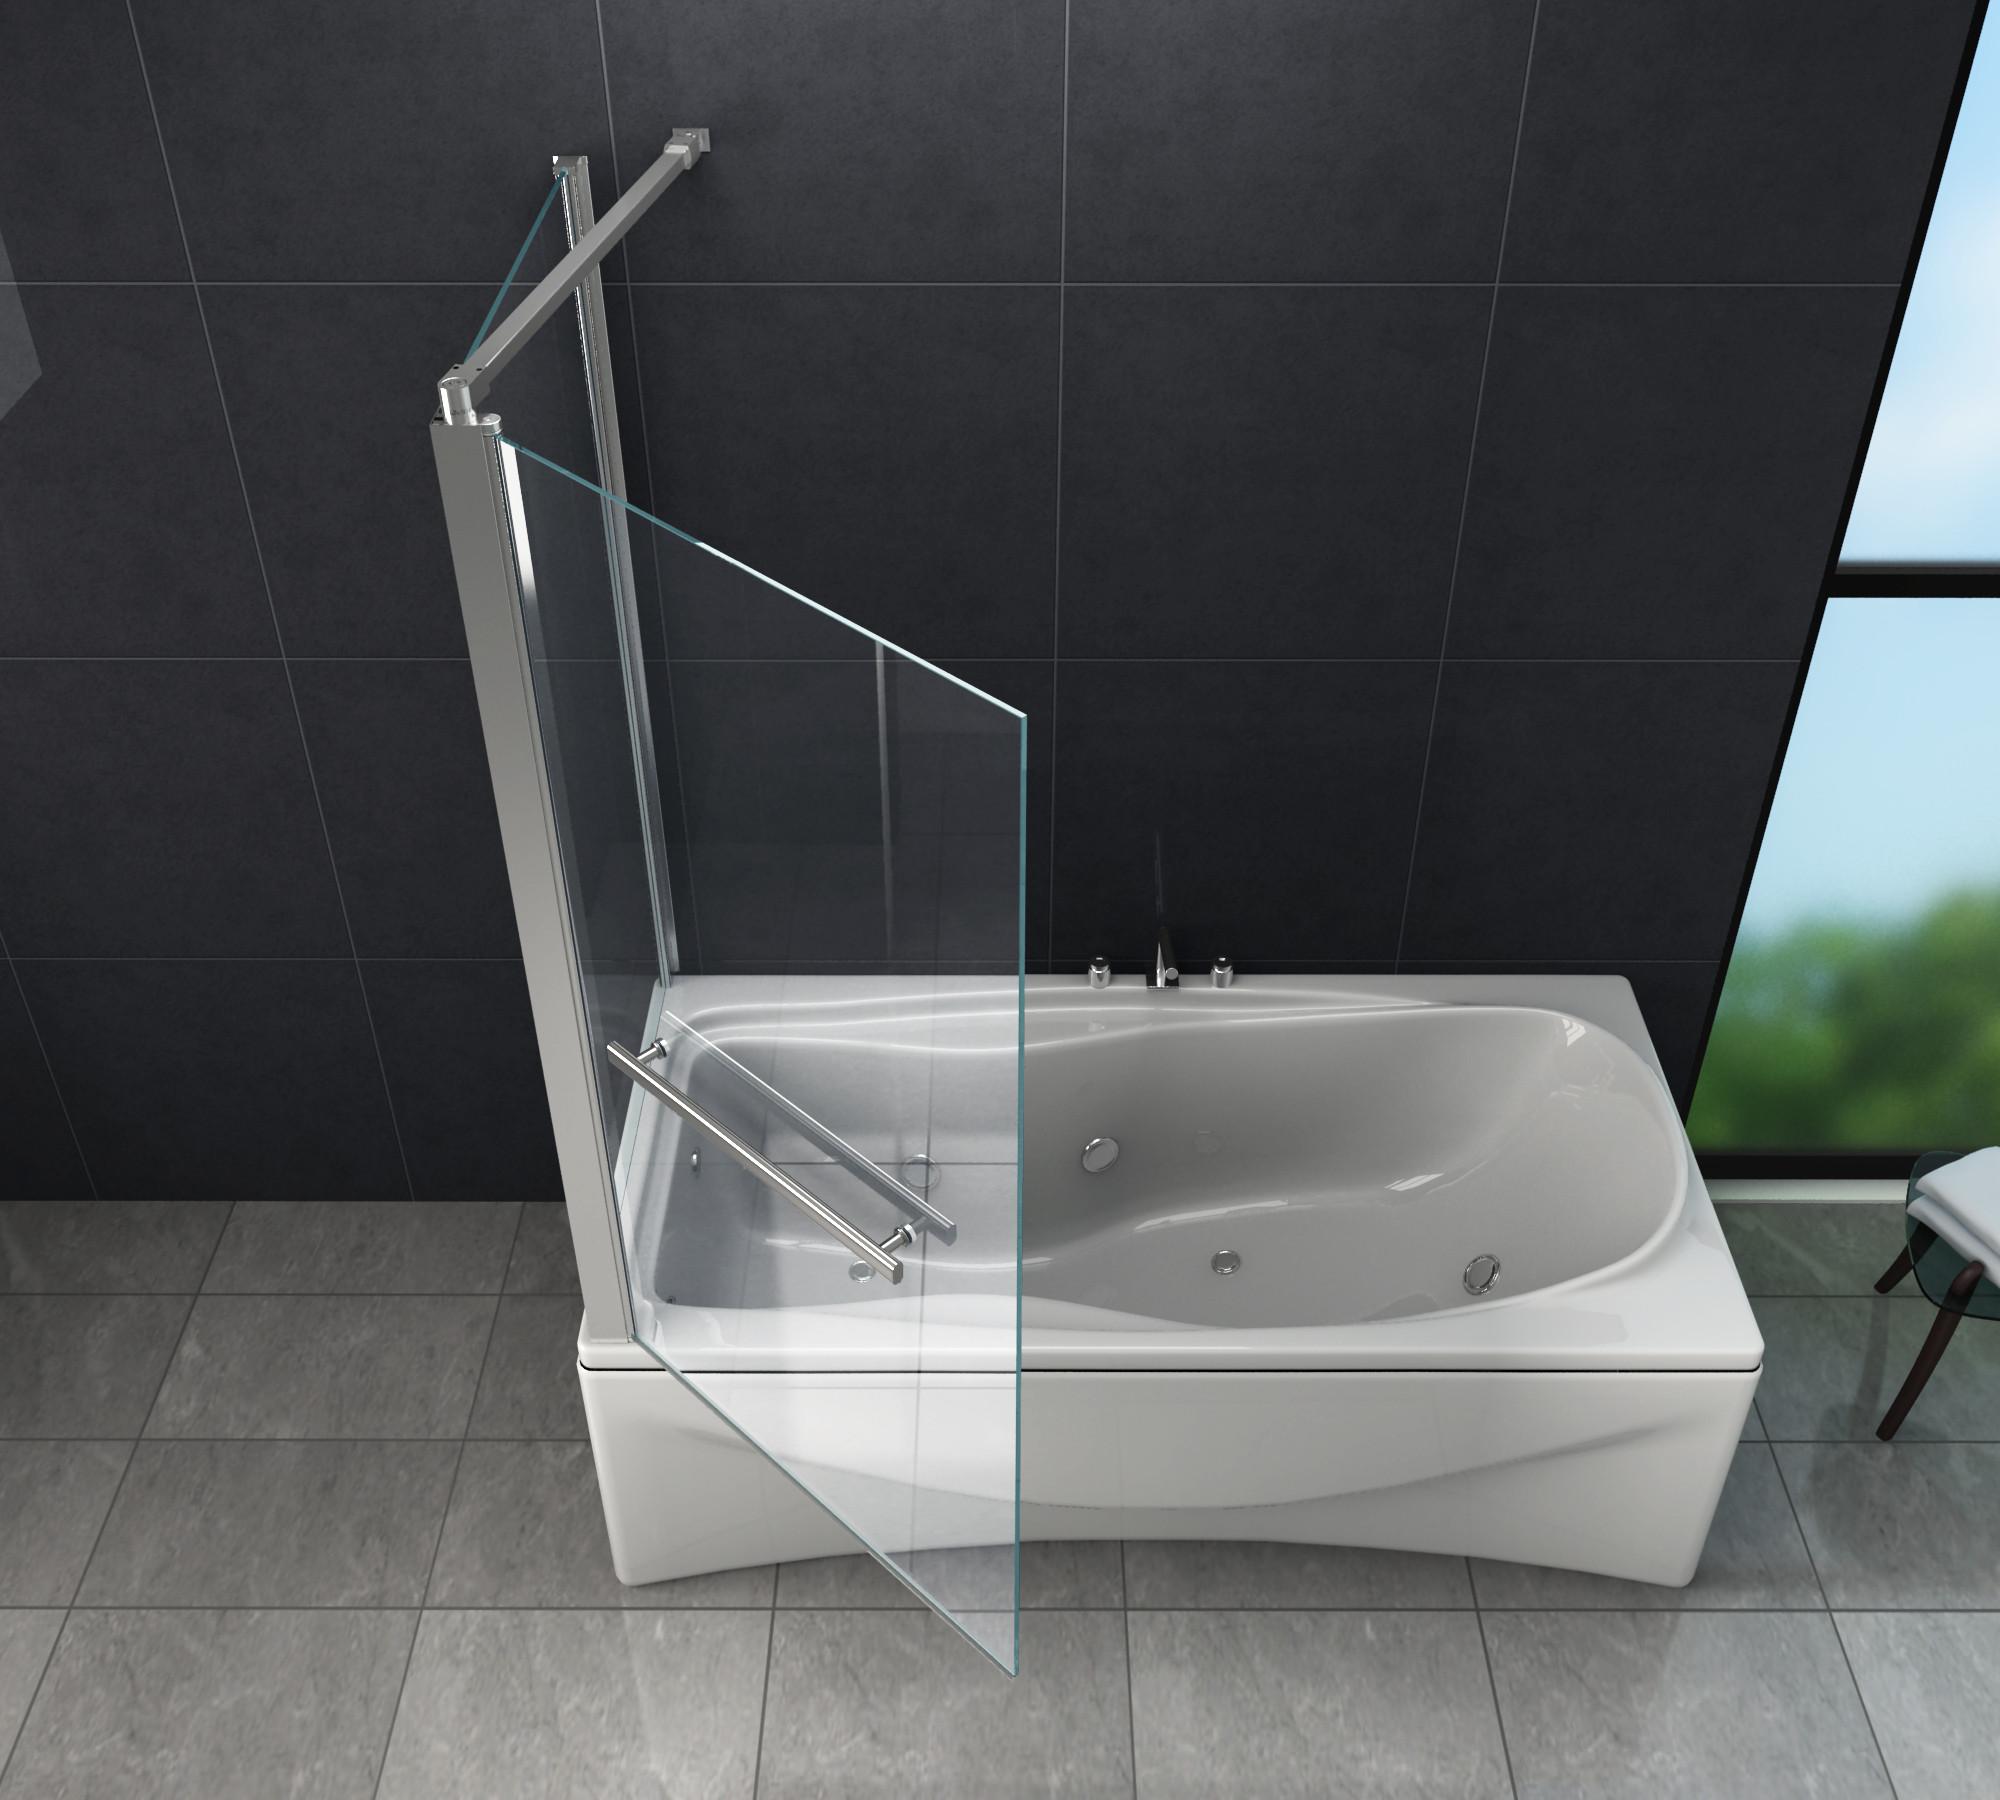 Badewanne Duschwand  Eck Duschtrennwand UNIONO 70 Badewanne Glasdeals